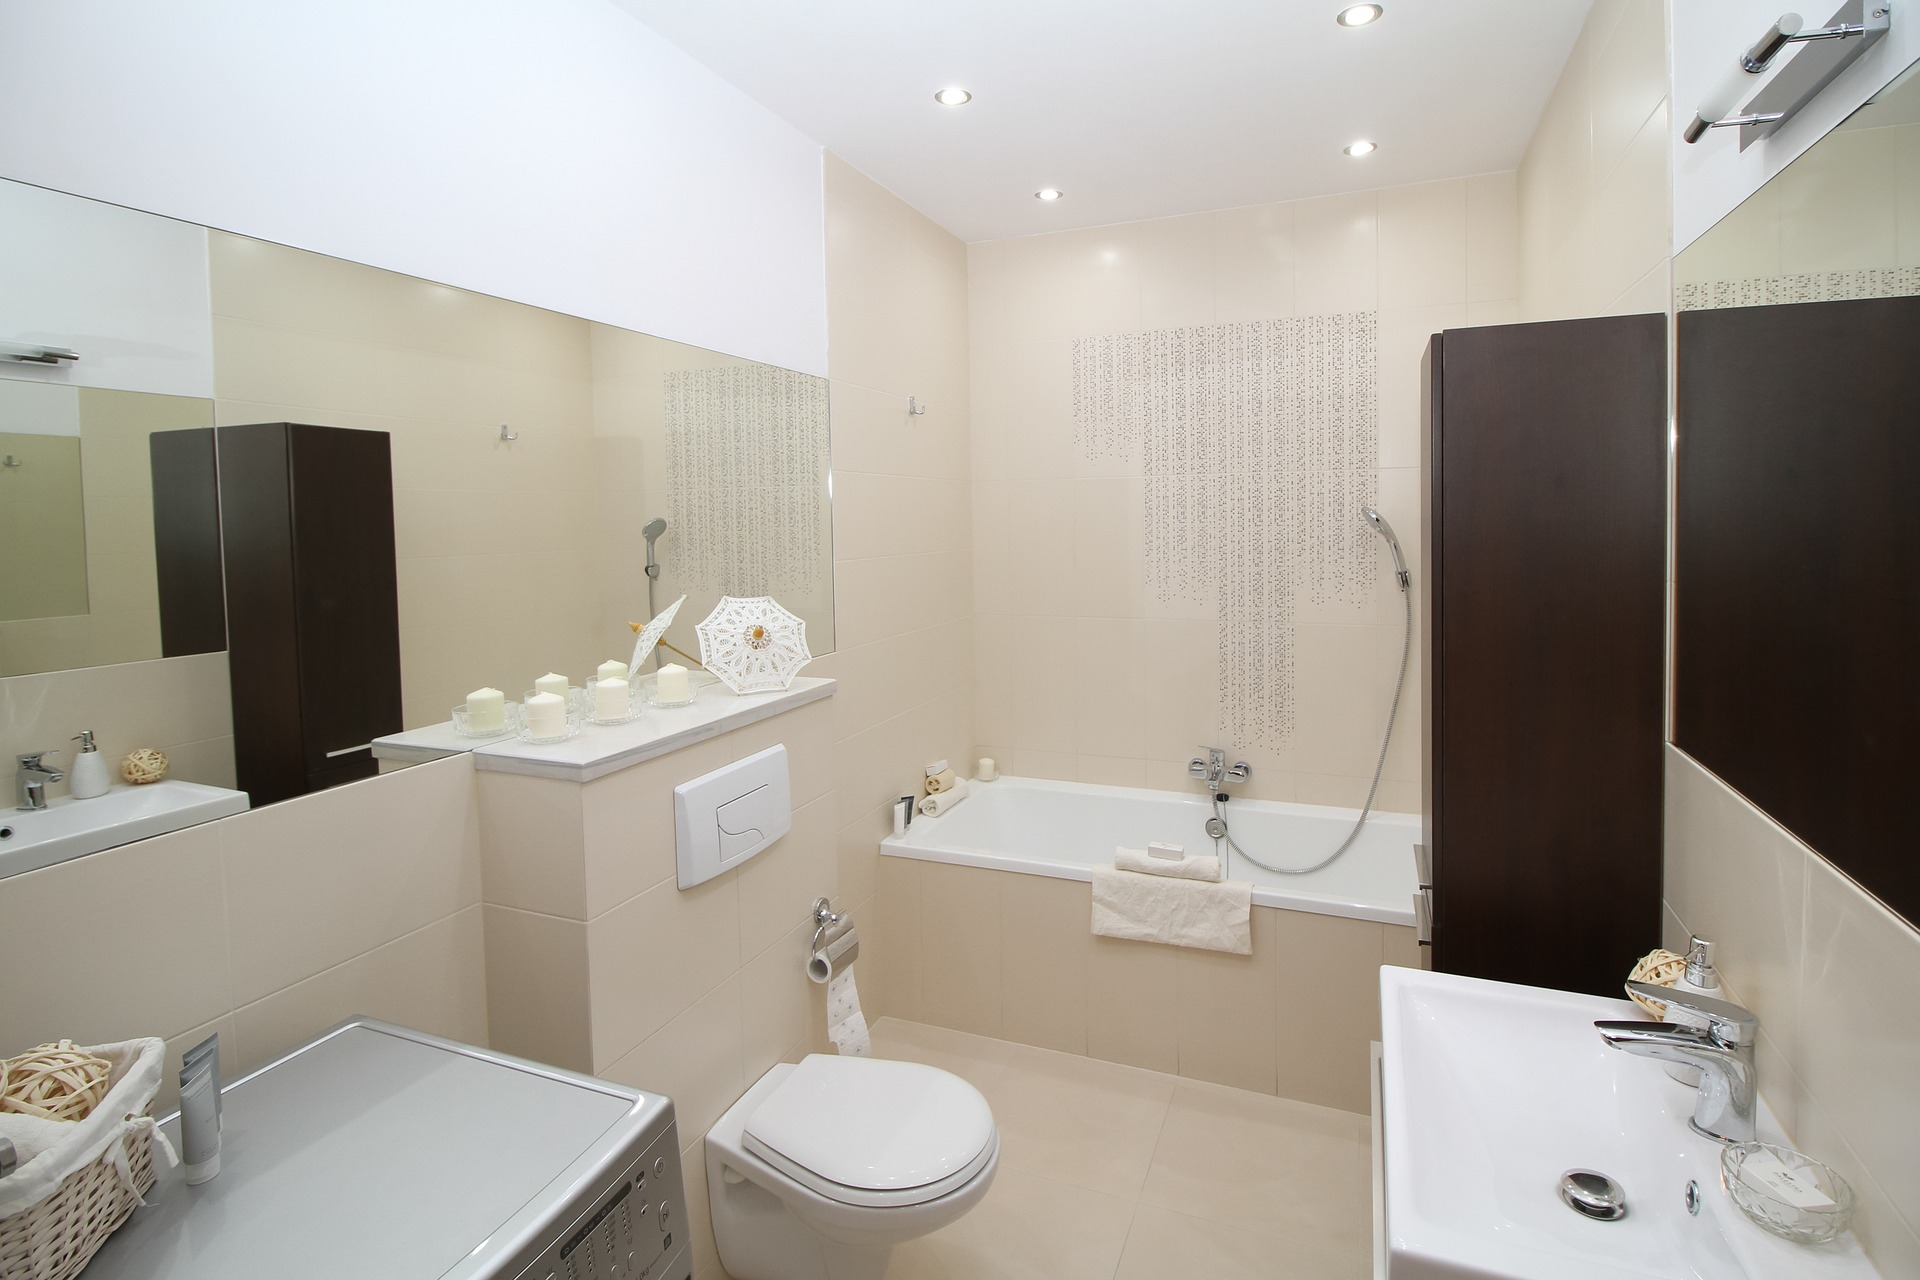 bathroom-2094733_1920.jpg